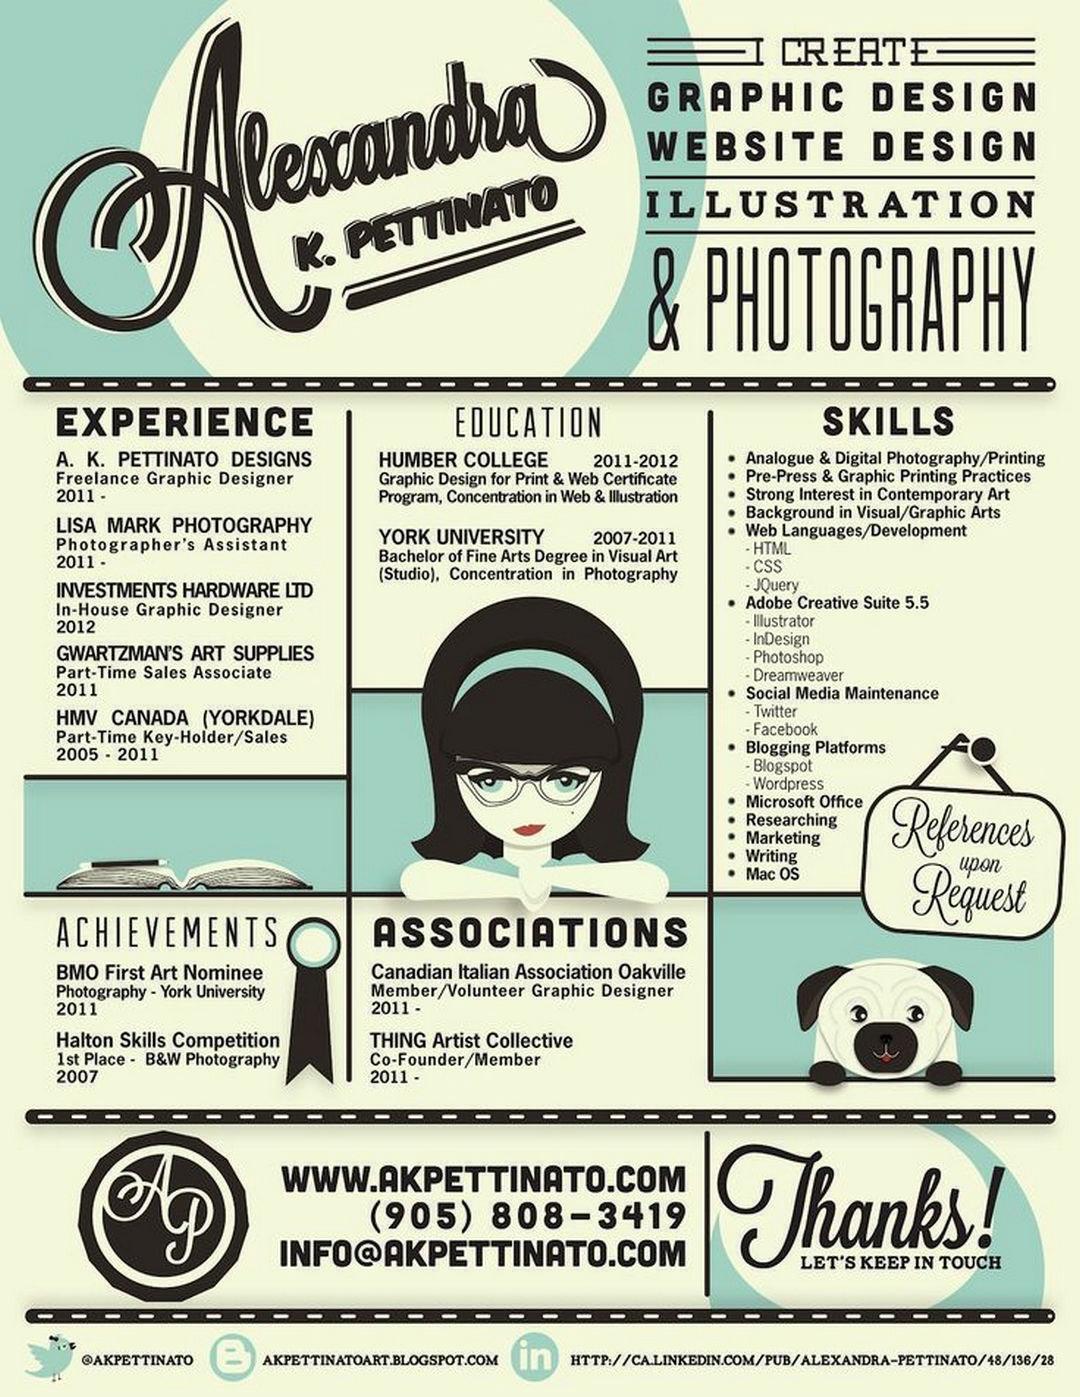 69 Well-Designed Graphic Design Resume Inspirations